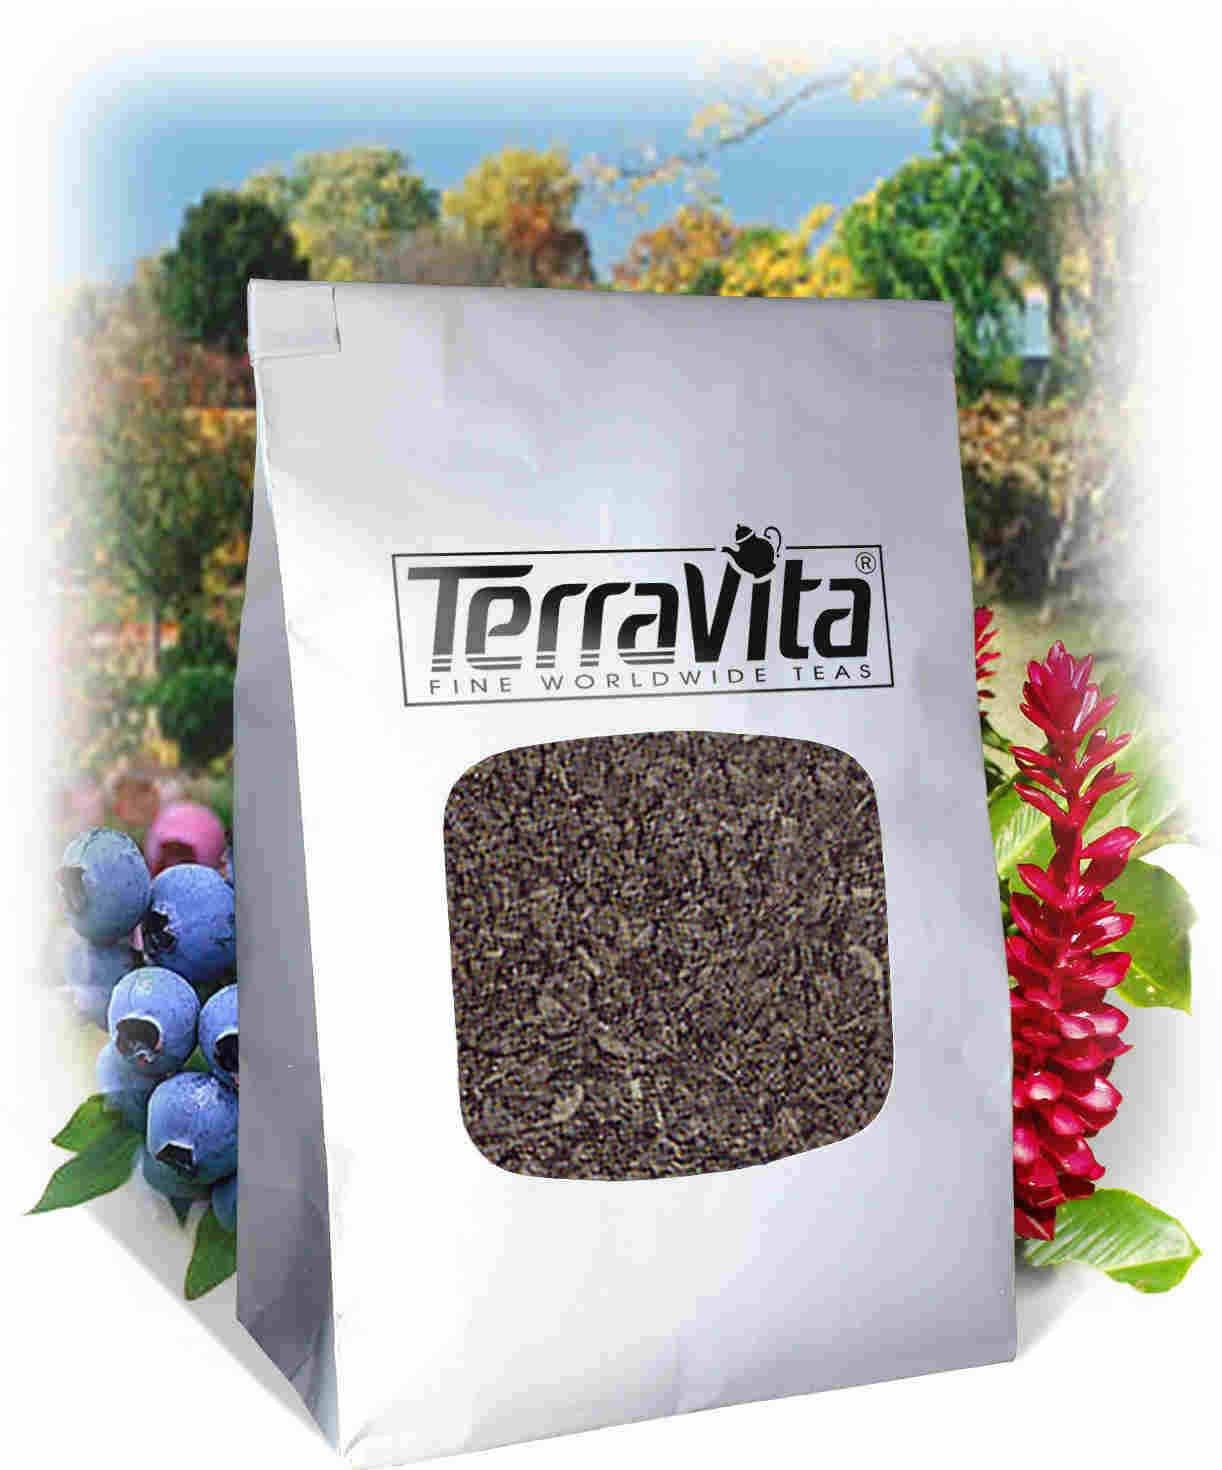 Cranesbill Regular discount Root Tea Loose Limited price 8 oz 3 Pack ZIN: 514755 -